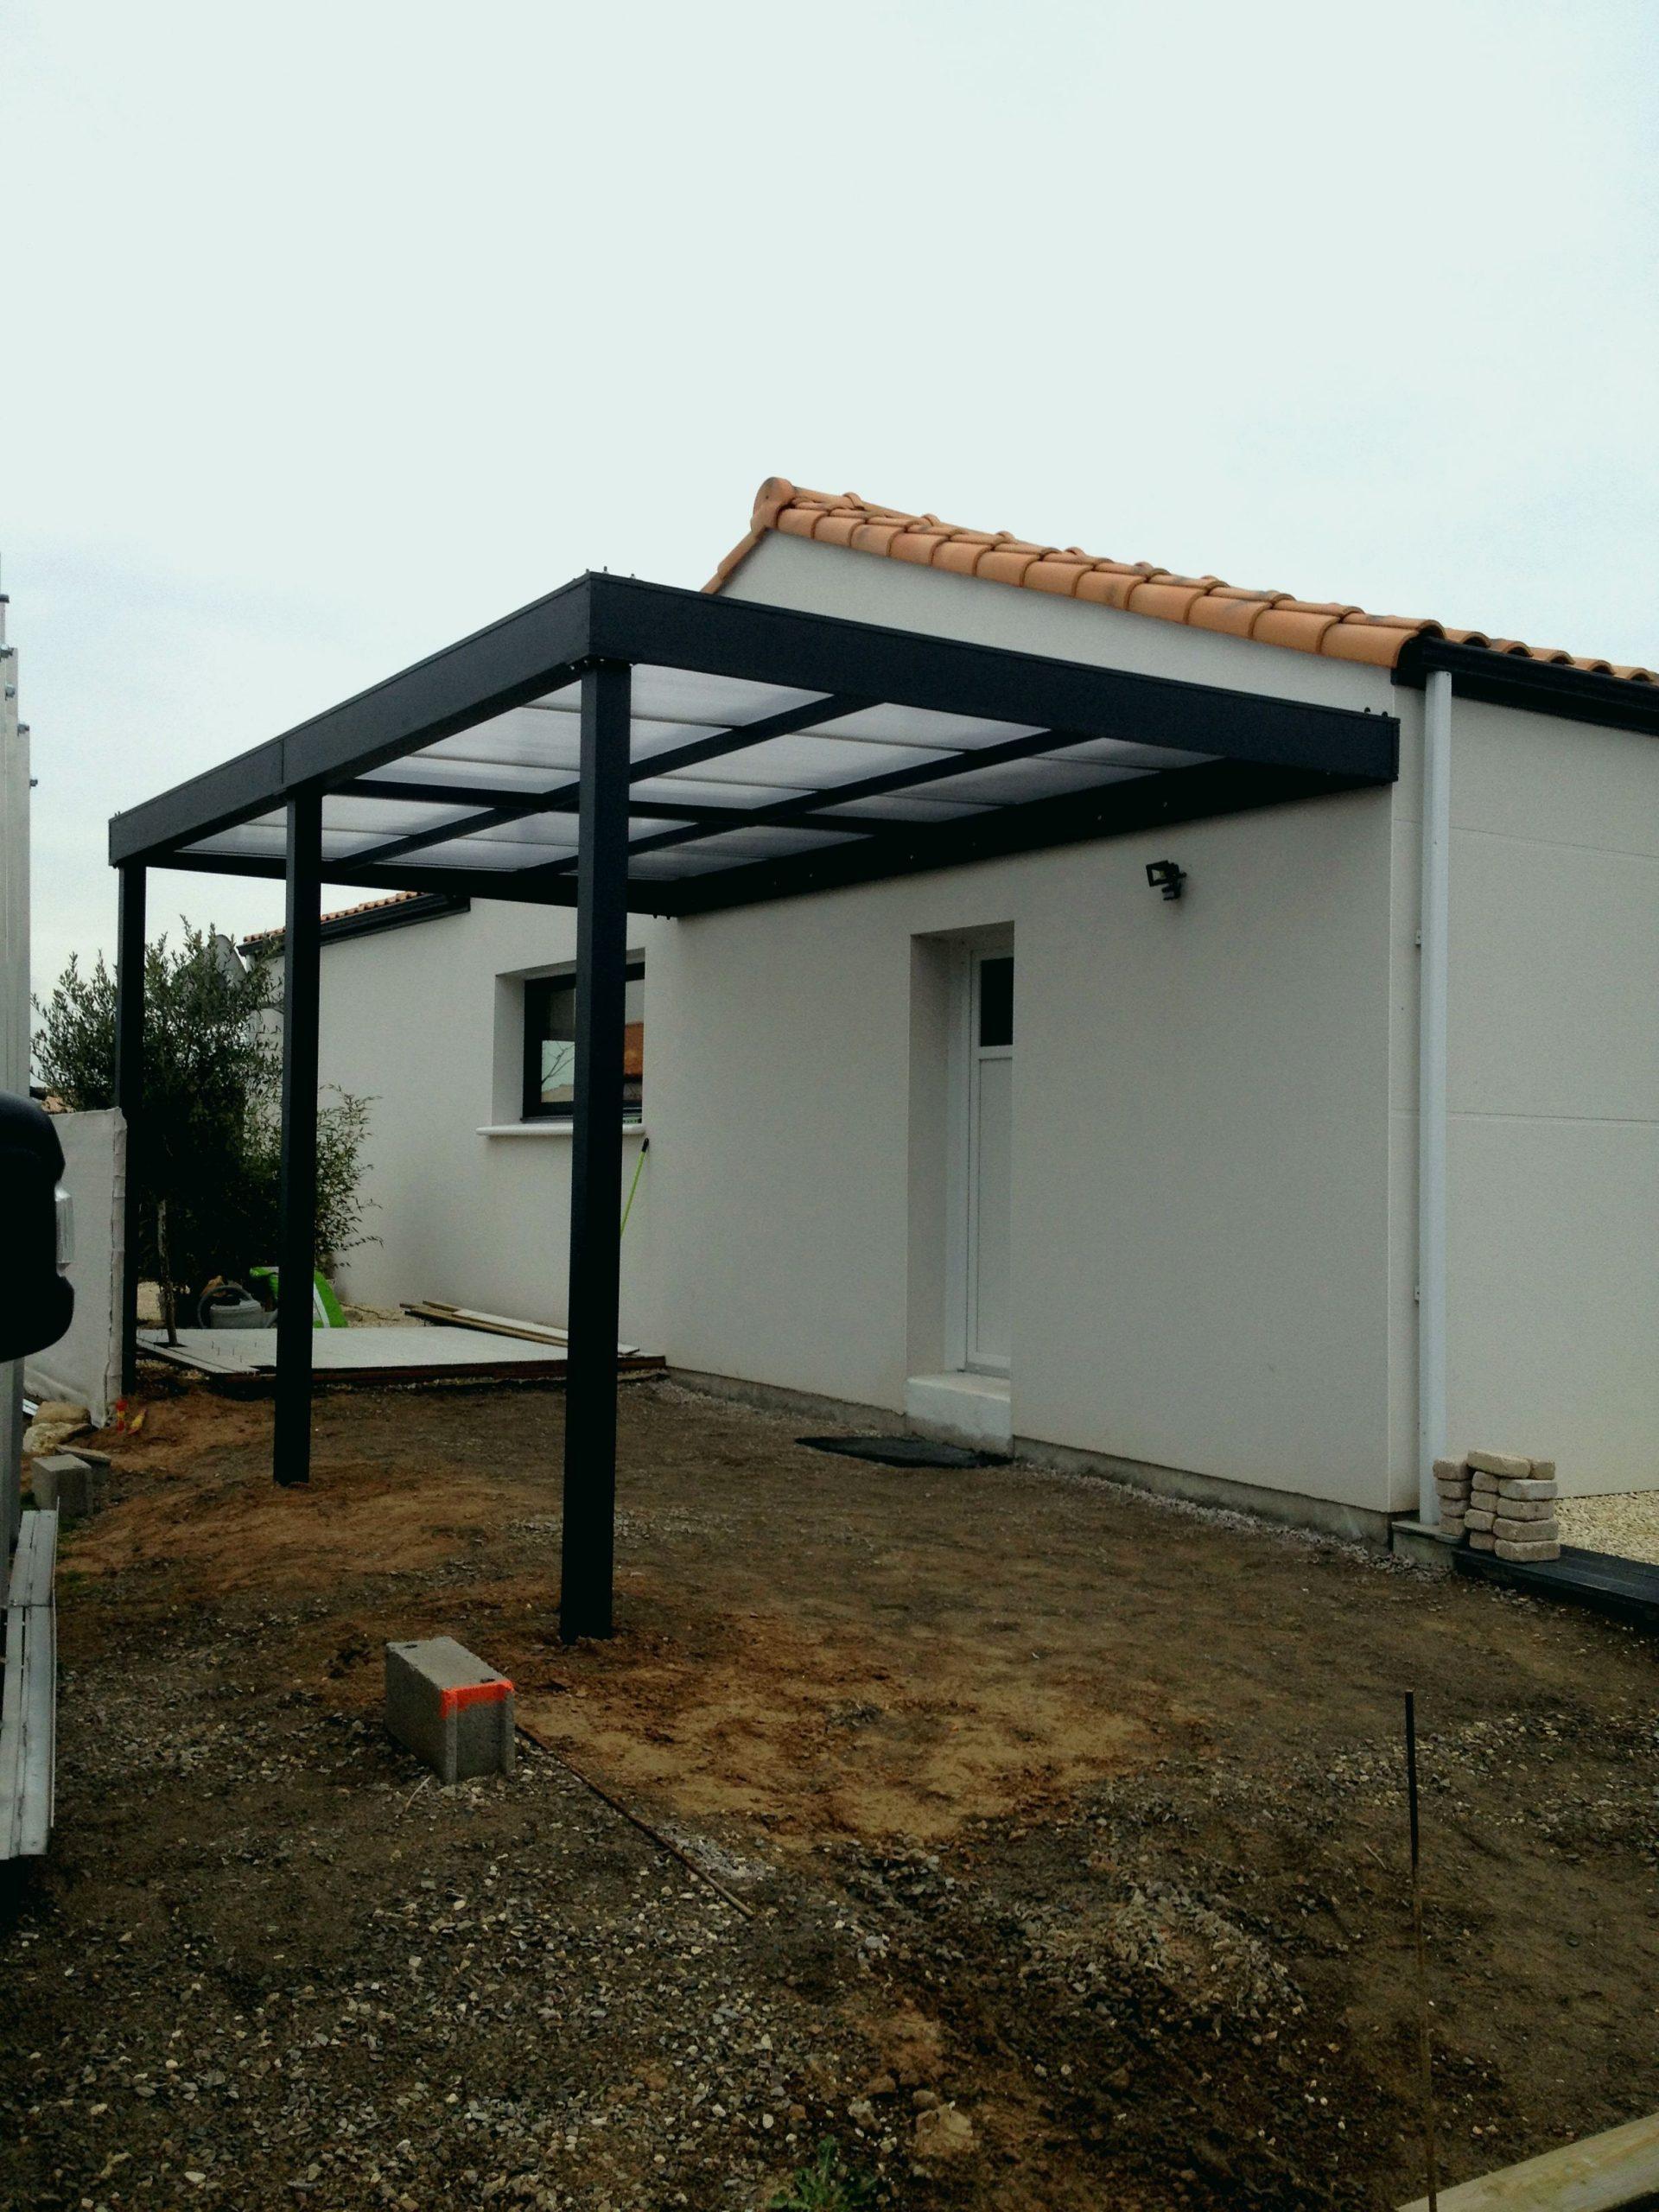 Kit Veranda Brico Depot - Veranda Et Abri Jardin avec Abri De Jardin Metal 10M2 Brico Depot